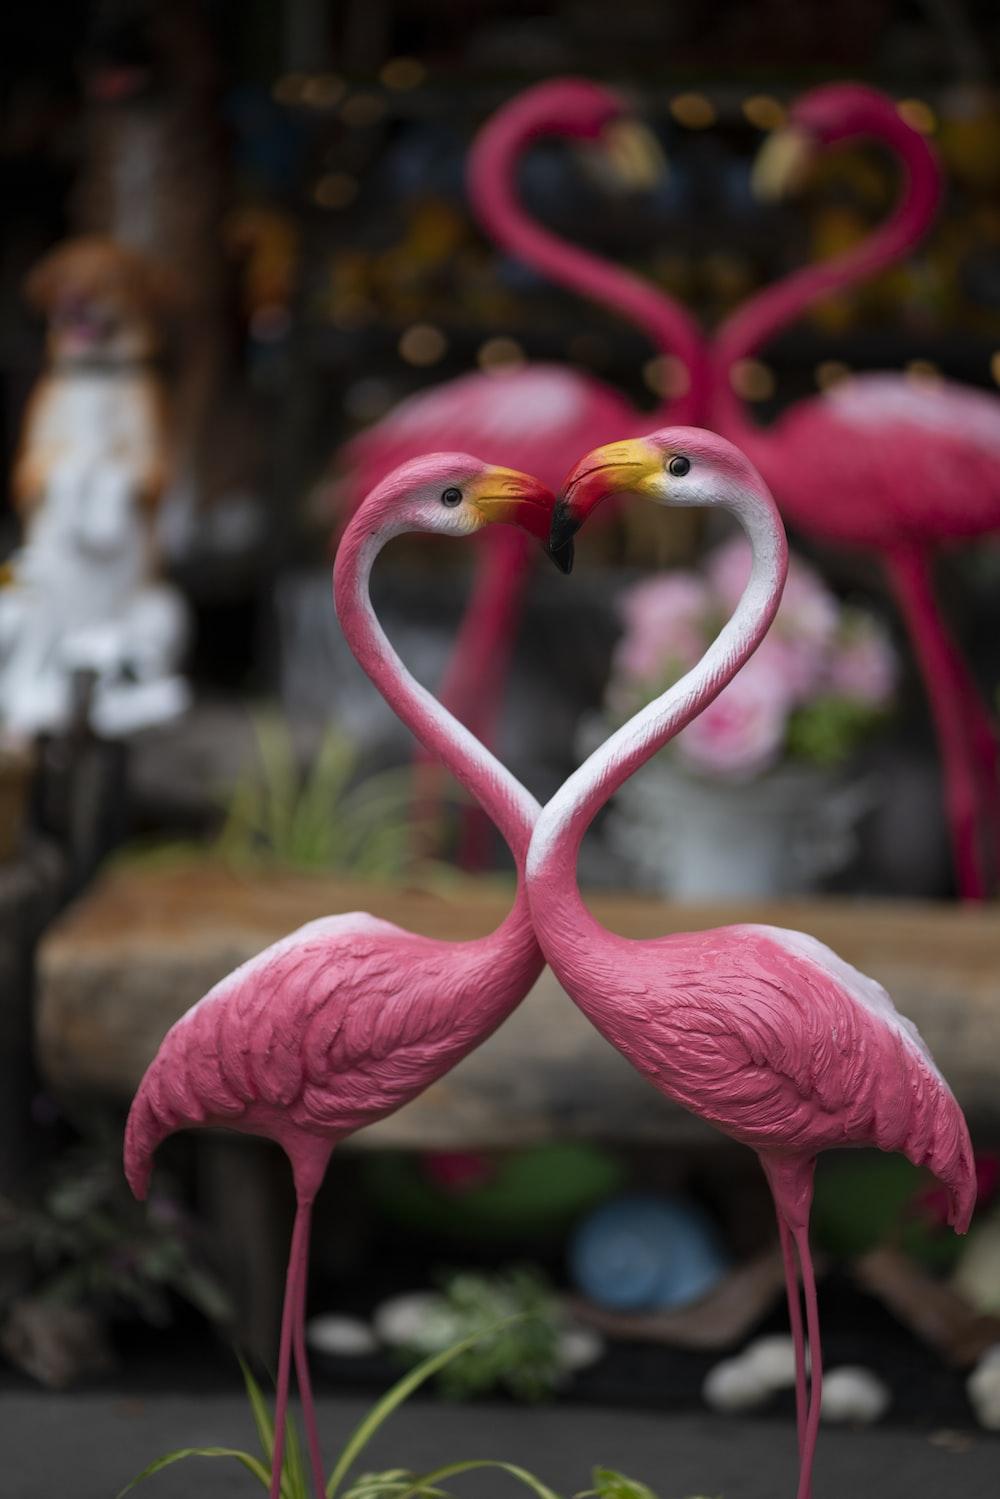 750 Love Birds Pictures Download Free Images On Unsplash